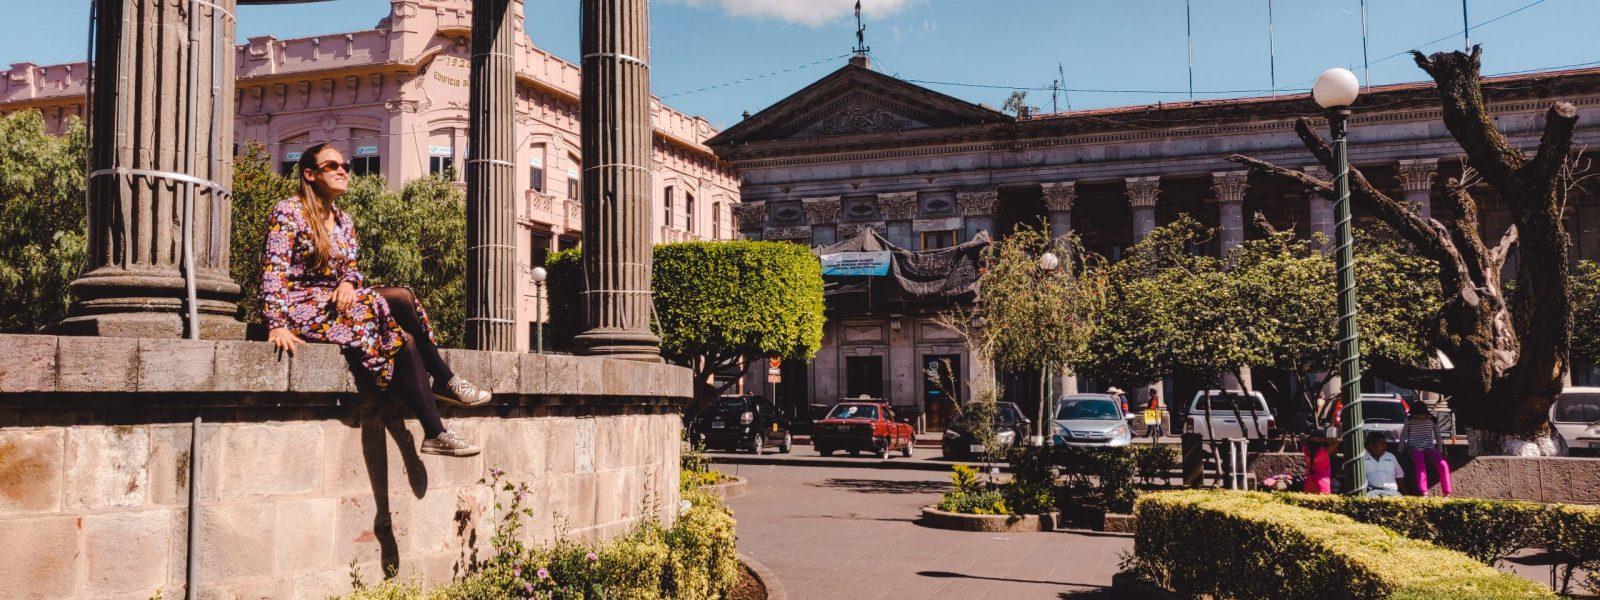 7 reasons to add Quetzaltenango to your Guatemala itinerary